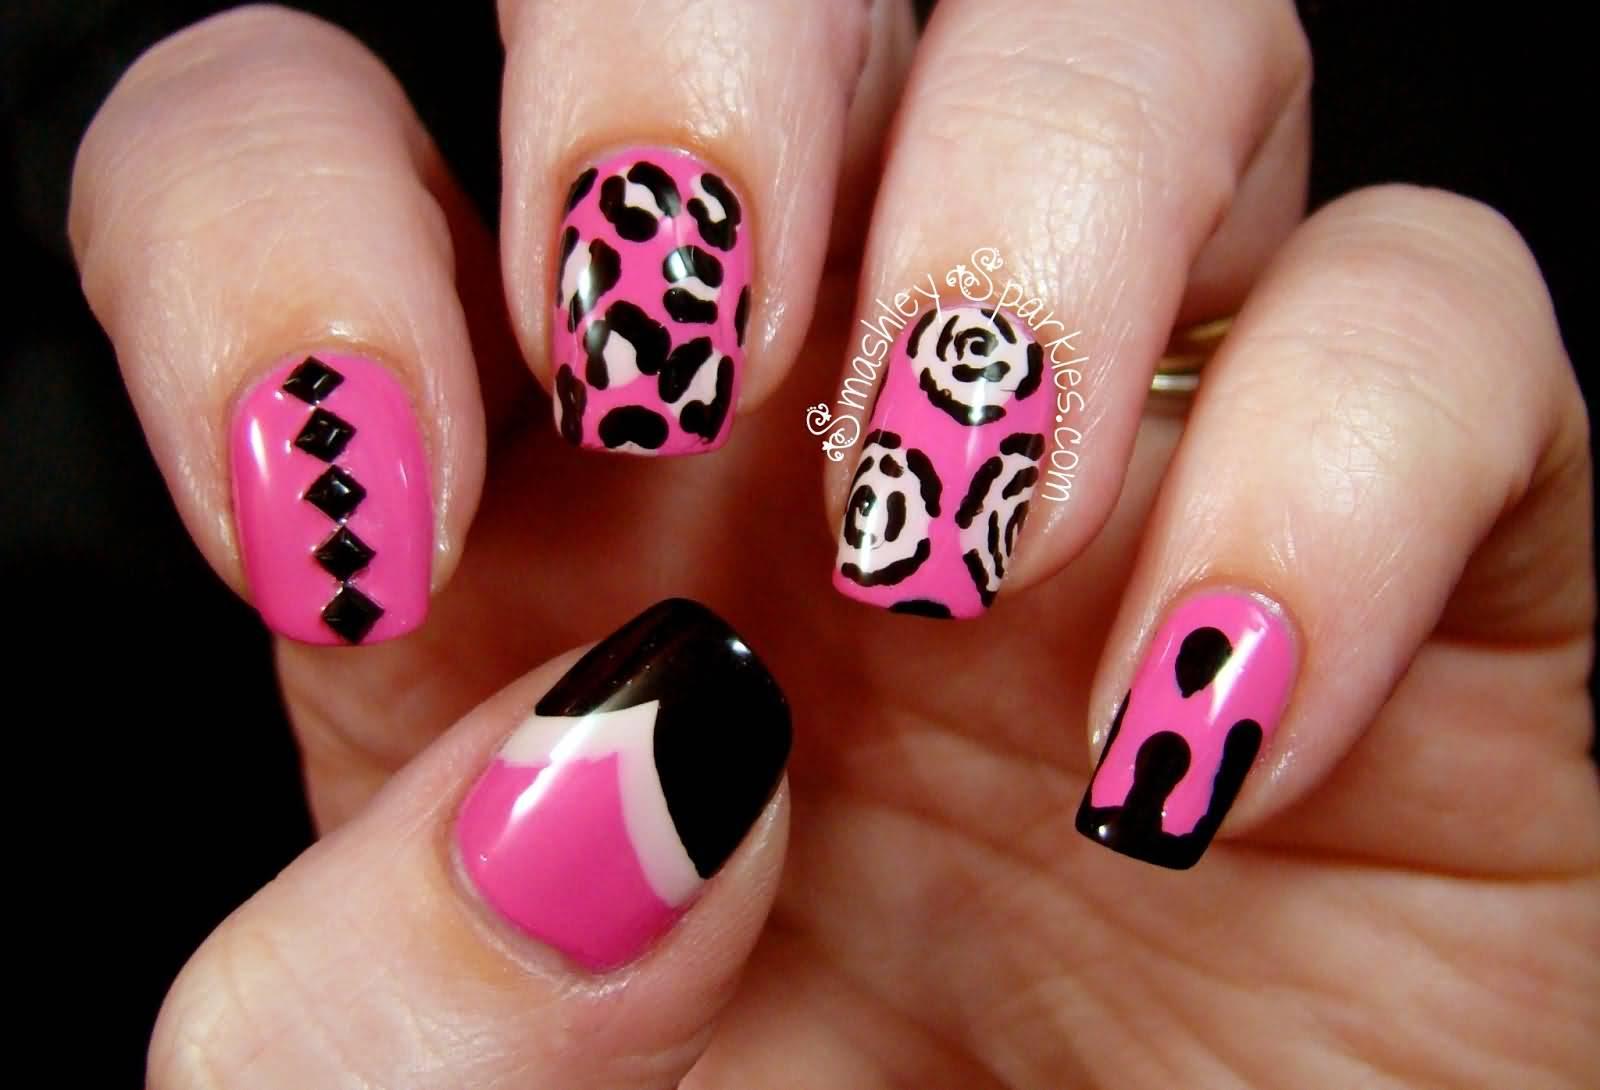 Cute Nail Designs With Red And Black: Nail d polish kiss halloween ...